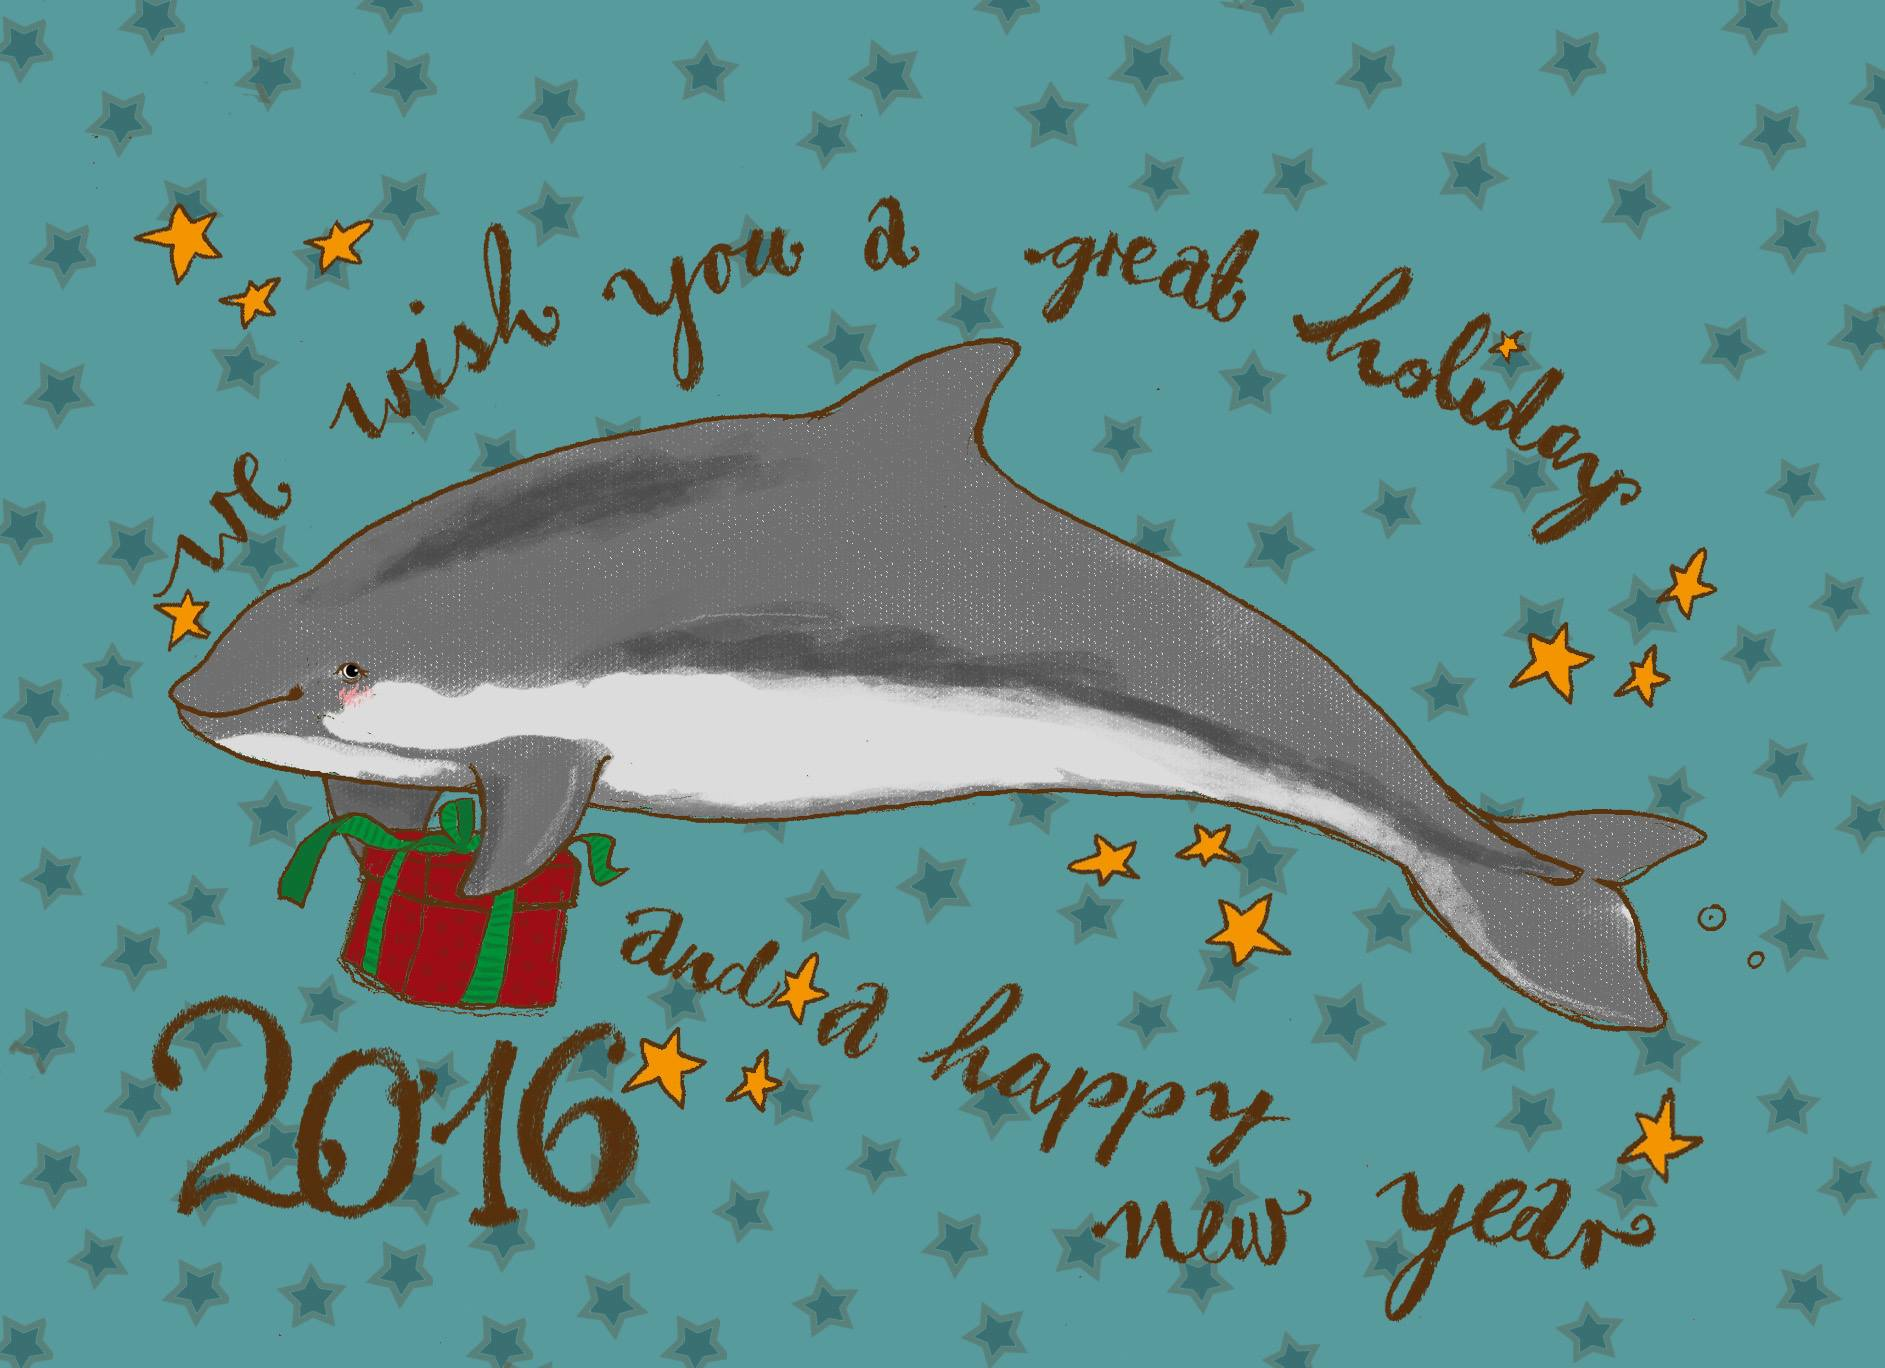 ASCOBANS Season's Greetings 2015 © Doro Schmitz